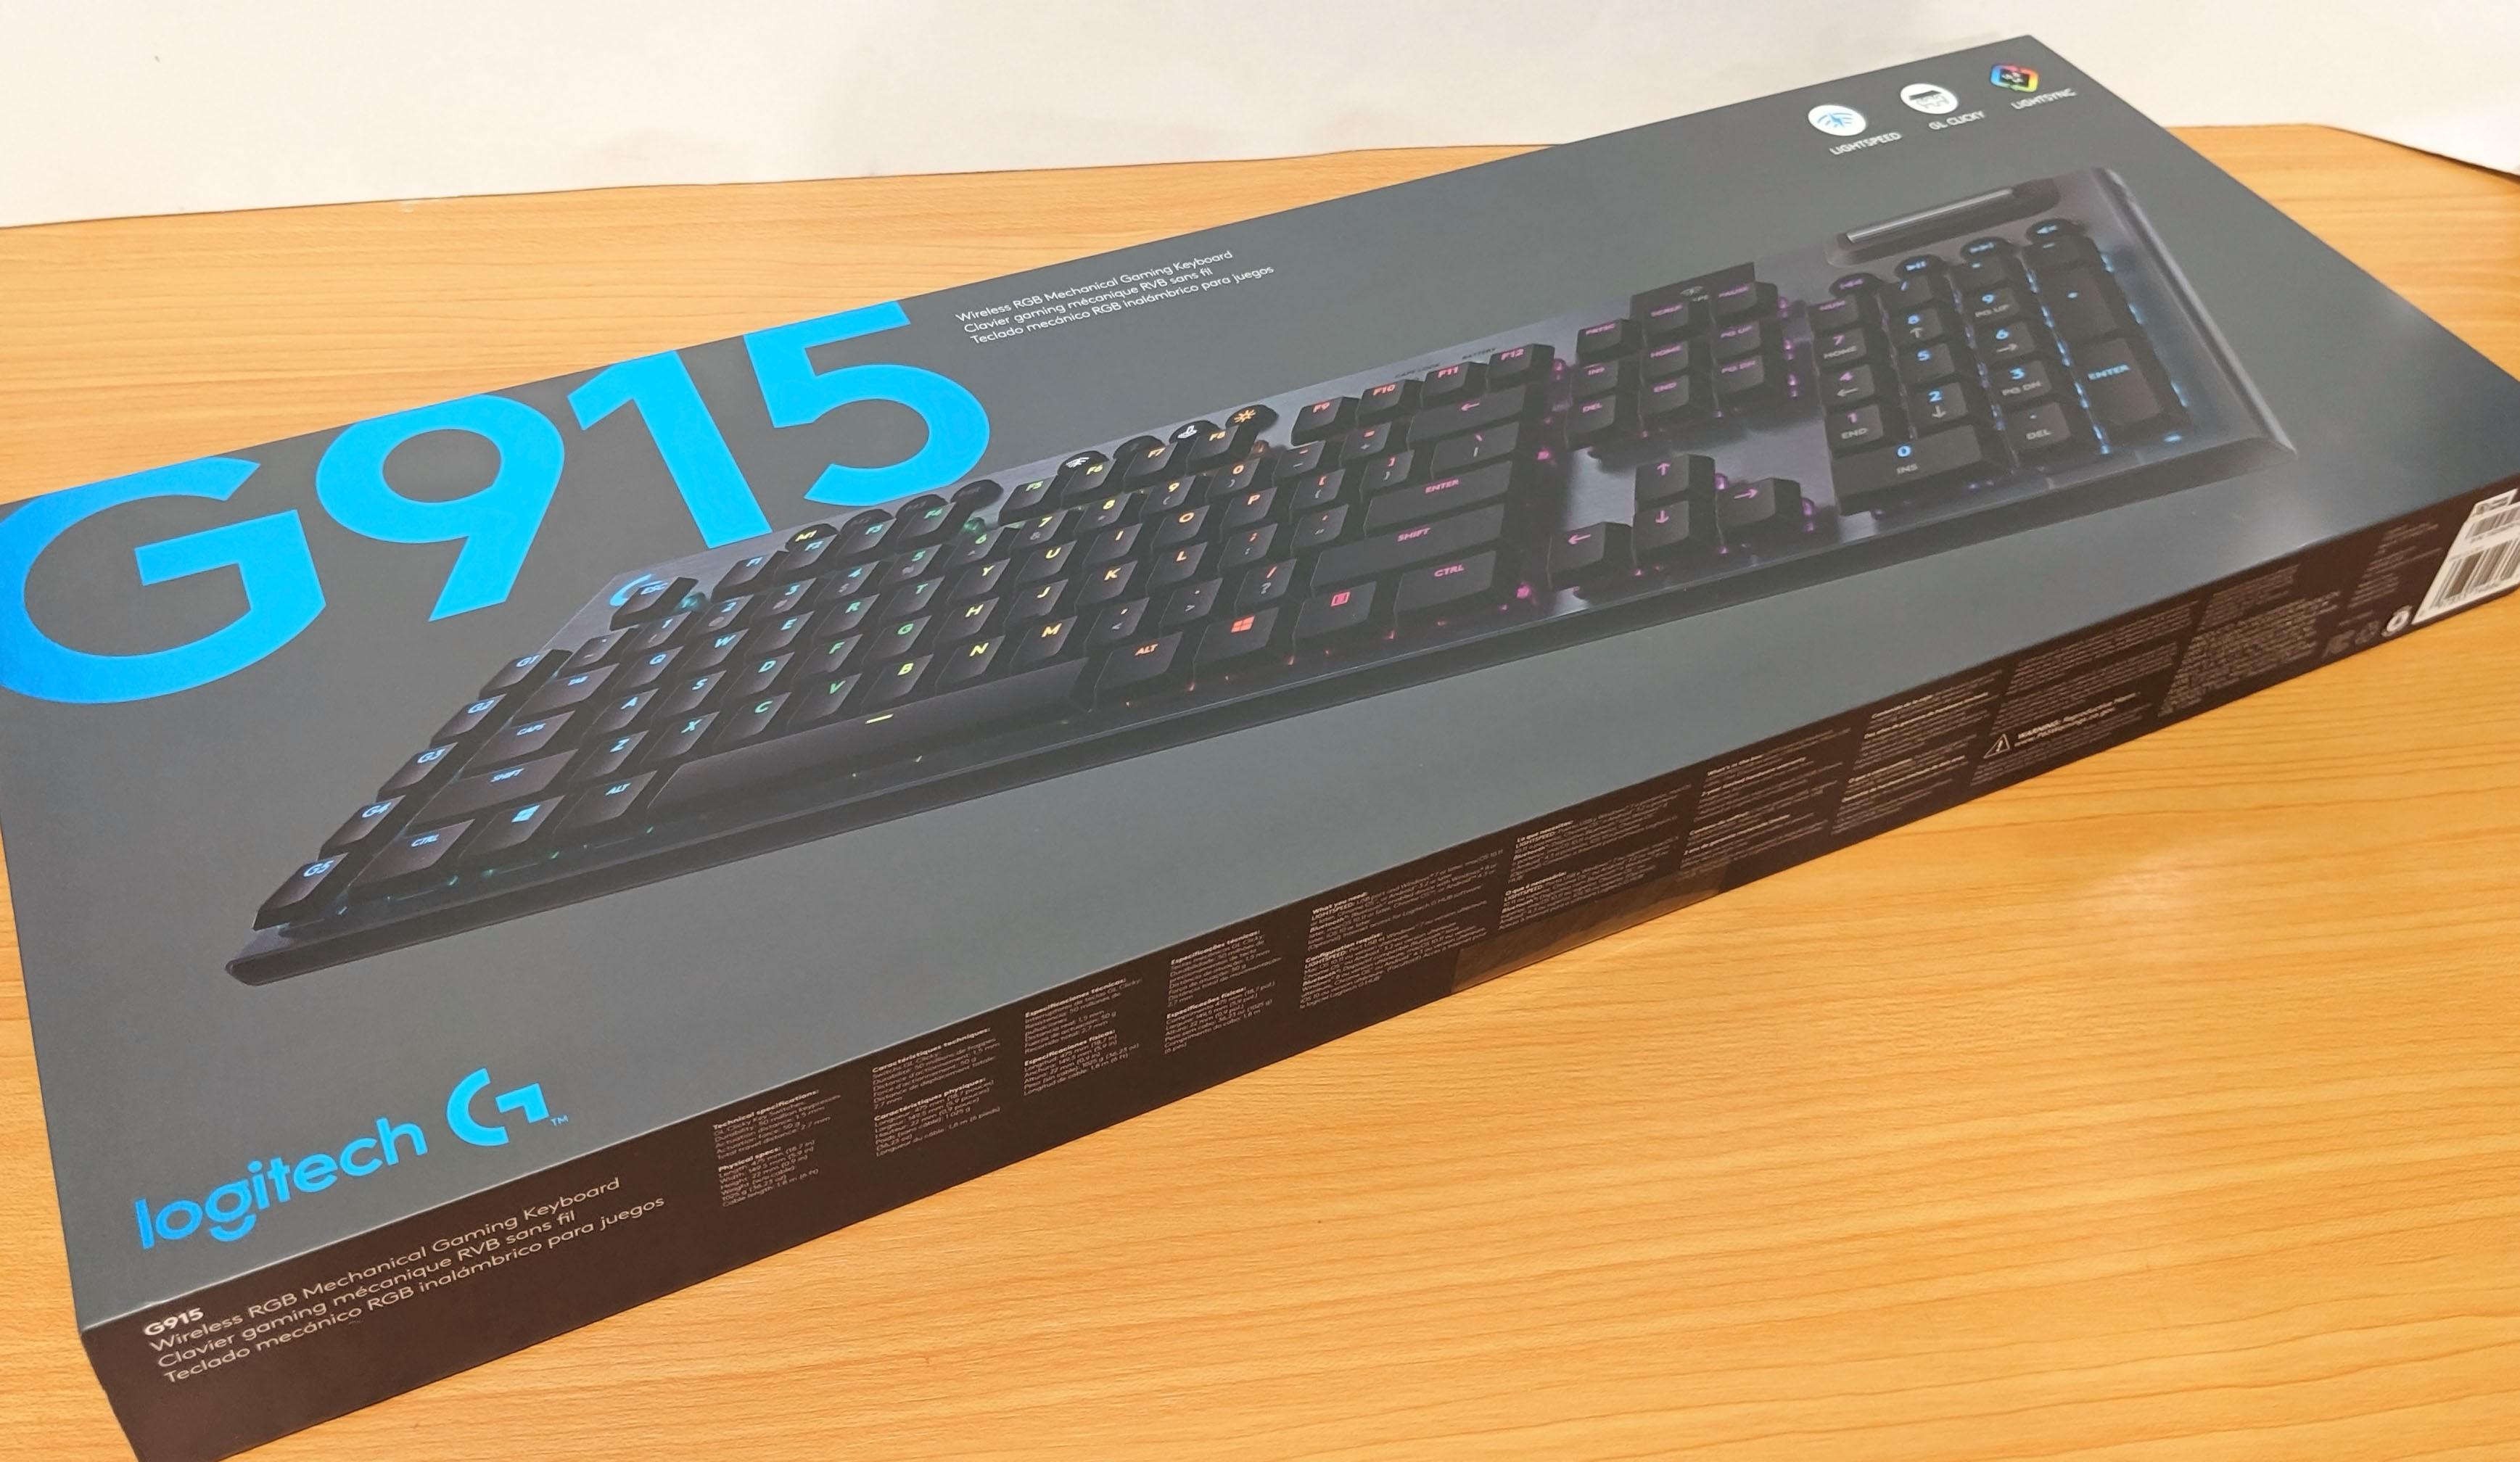 Logitech G915 LIGHTSPEED Gaming Keyboard Review (GL Clicky